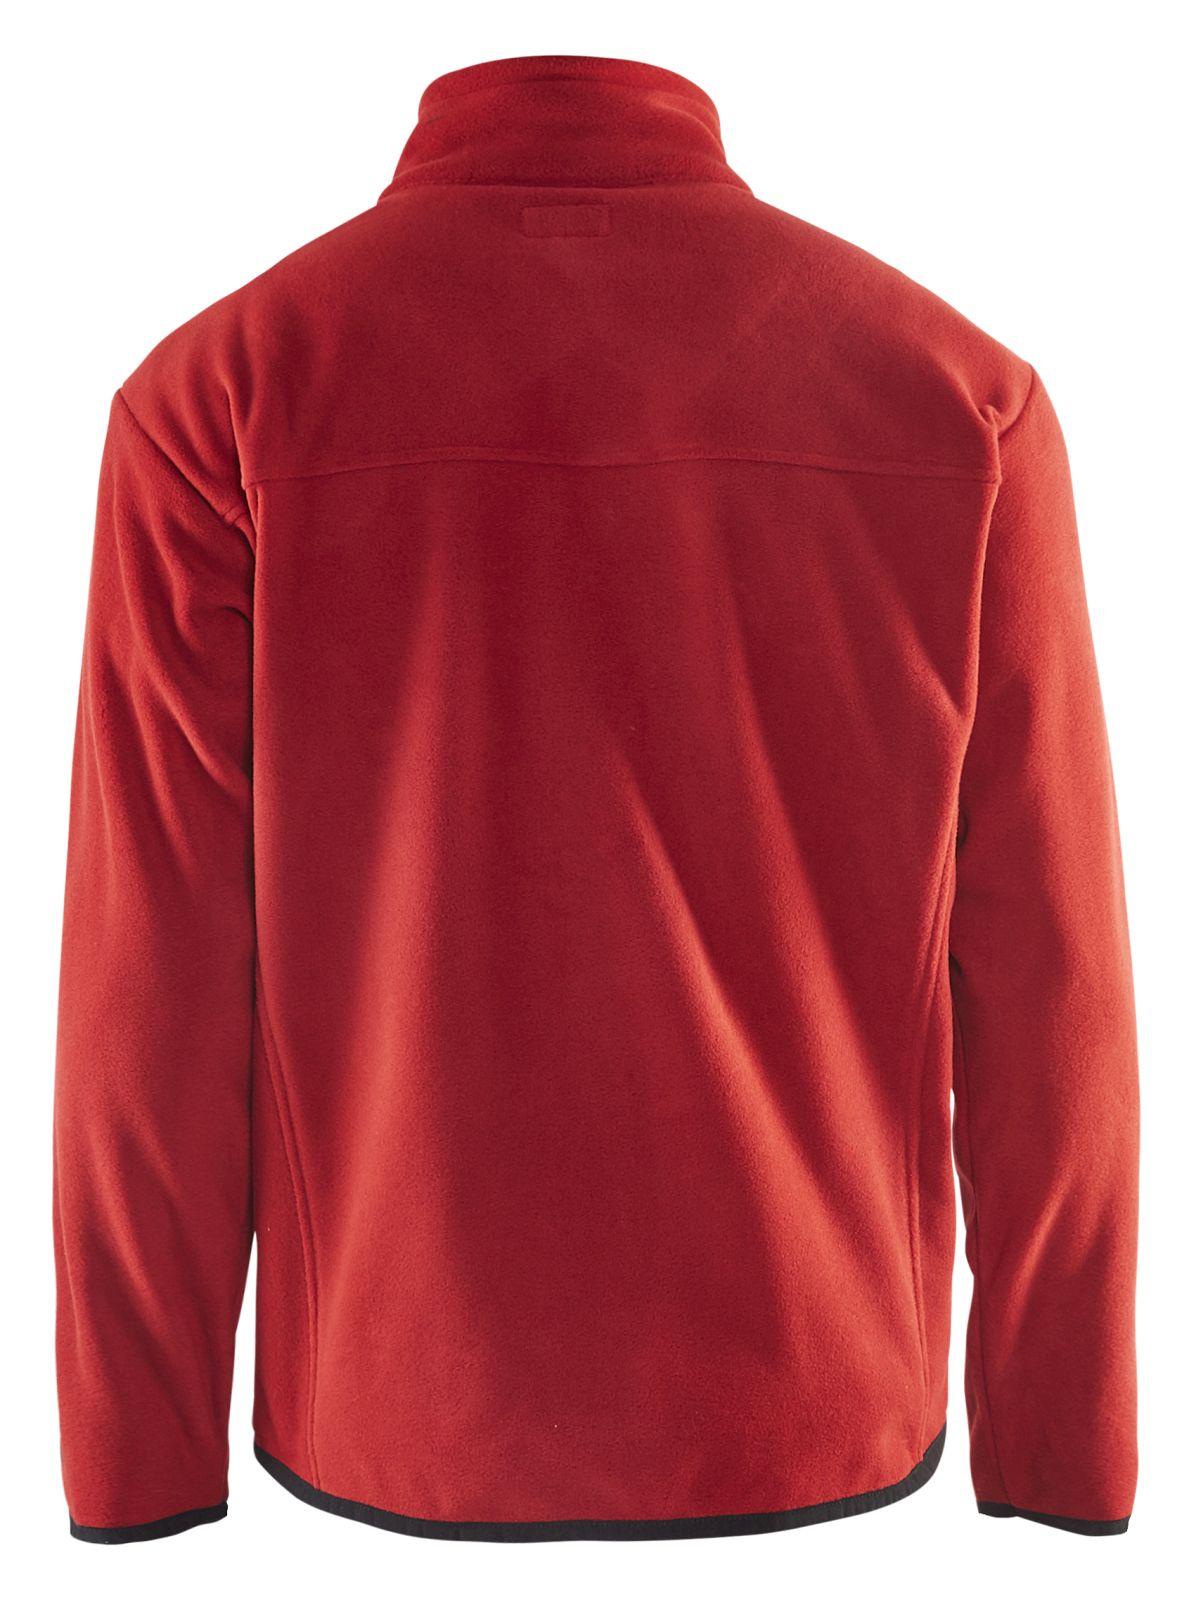 Blaklader Vesten 48302510 rood(5600)